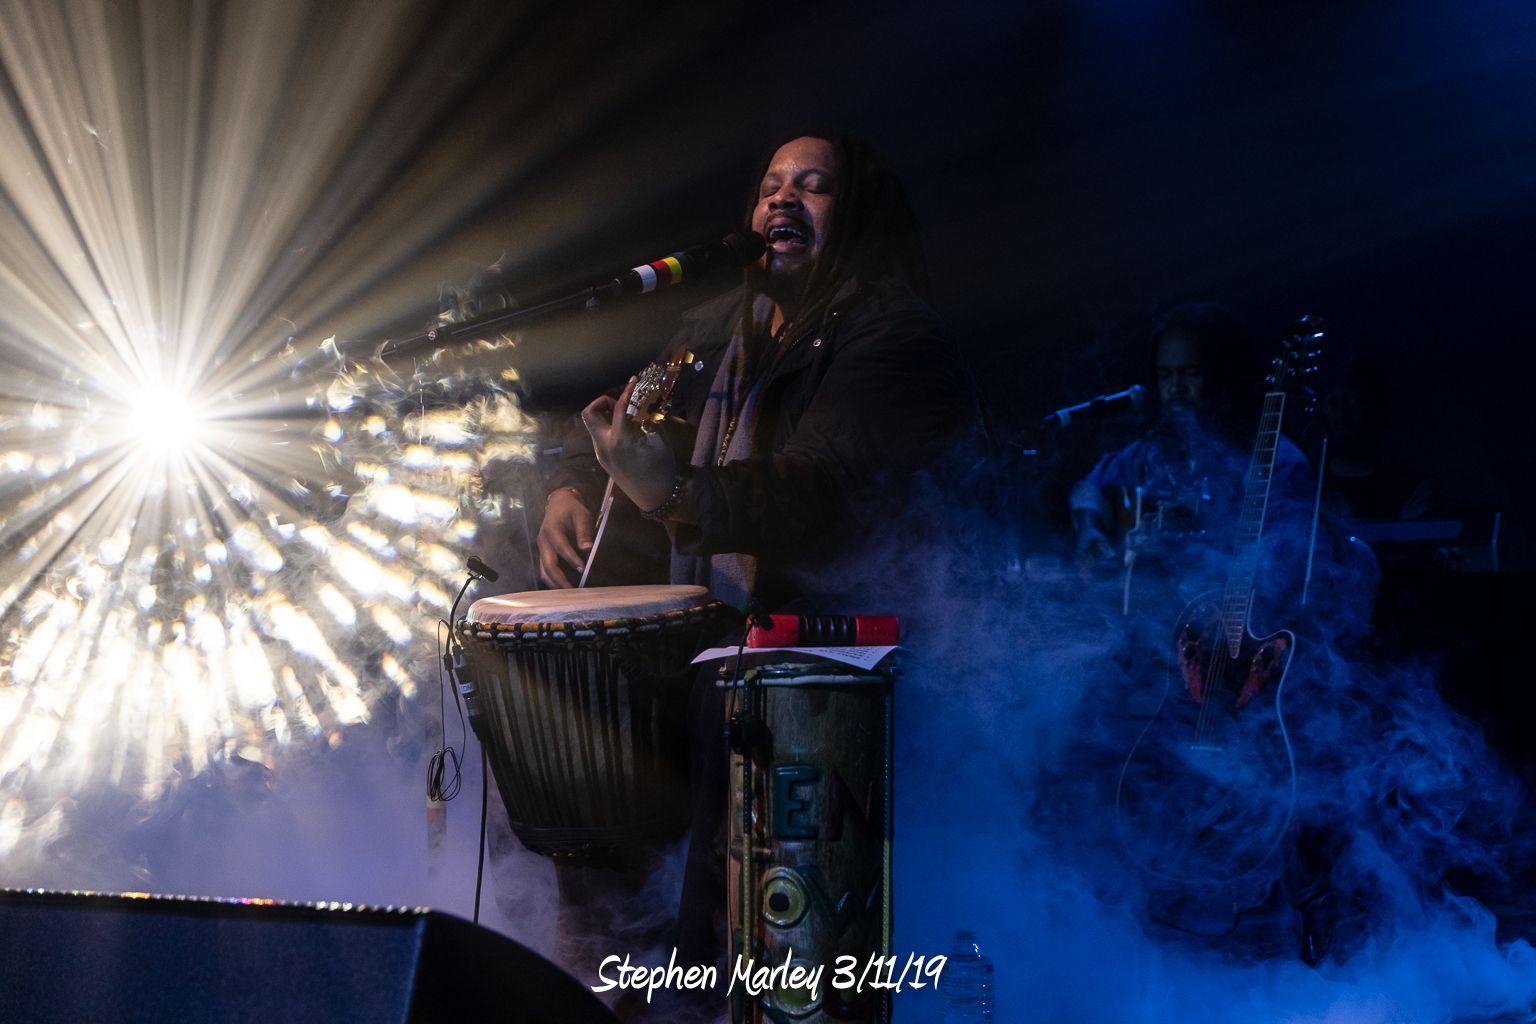 Stephen Marley 3/11/19